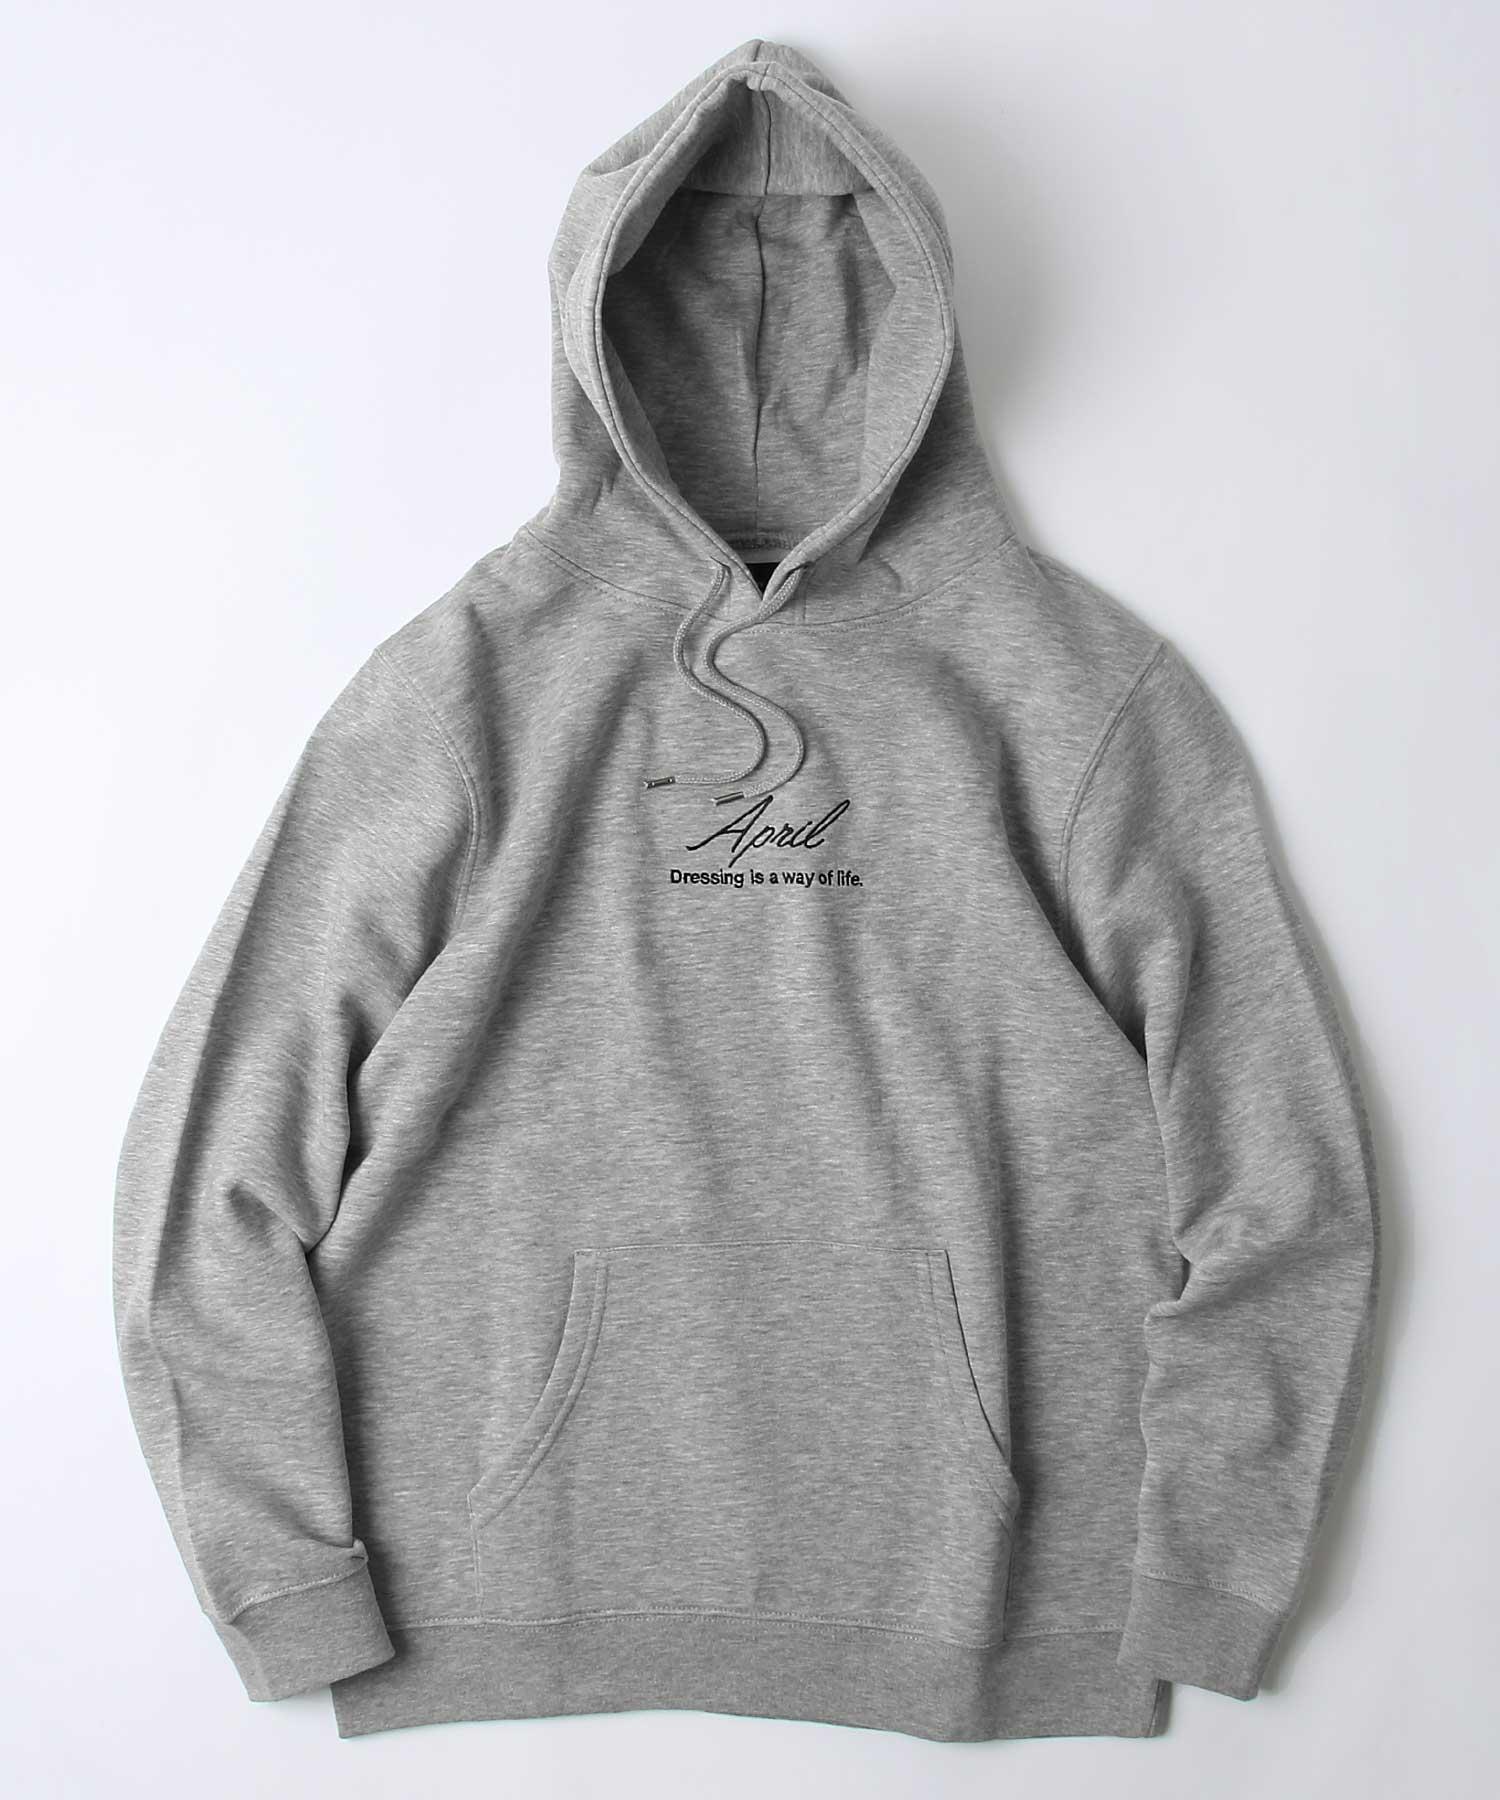 【ZIP】刷毛連帽運動衫【L-XL】 1